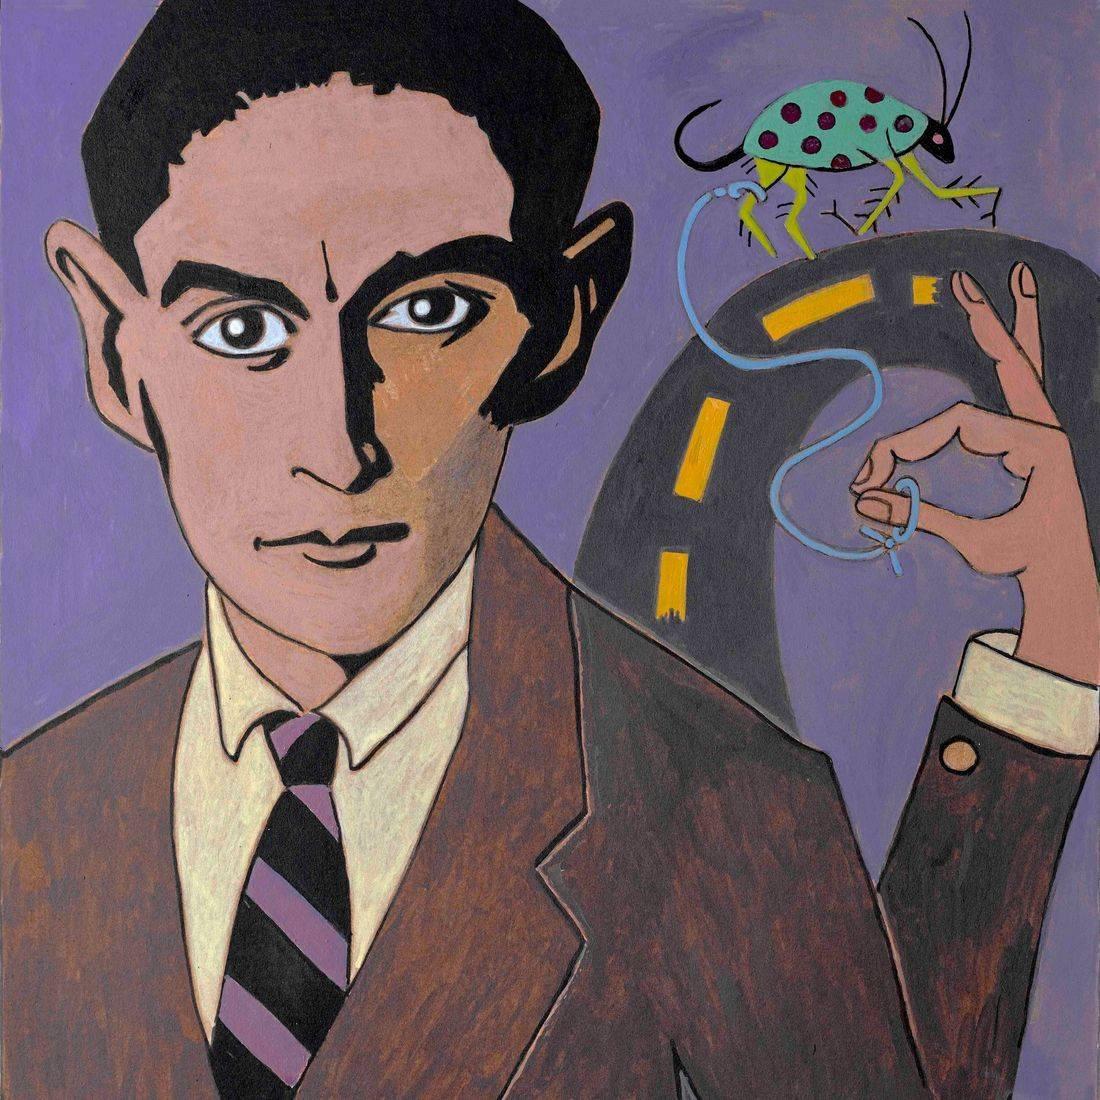 Franz Kafka, The Metamorphosis, Cockroach, Existentialism, Nihilism